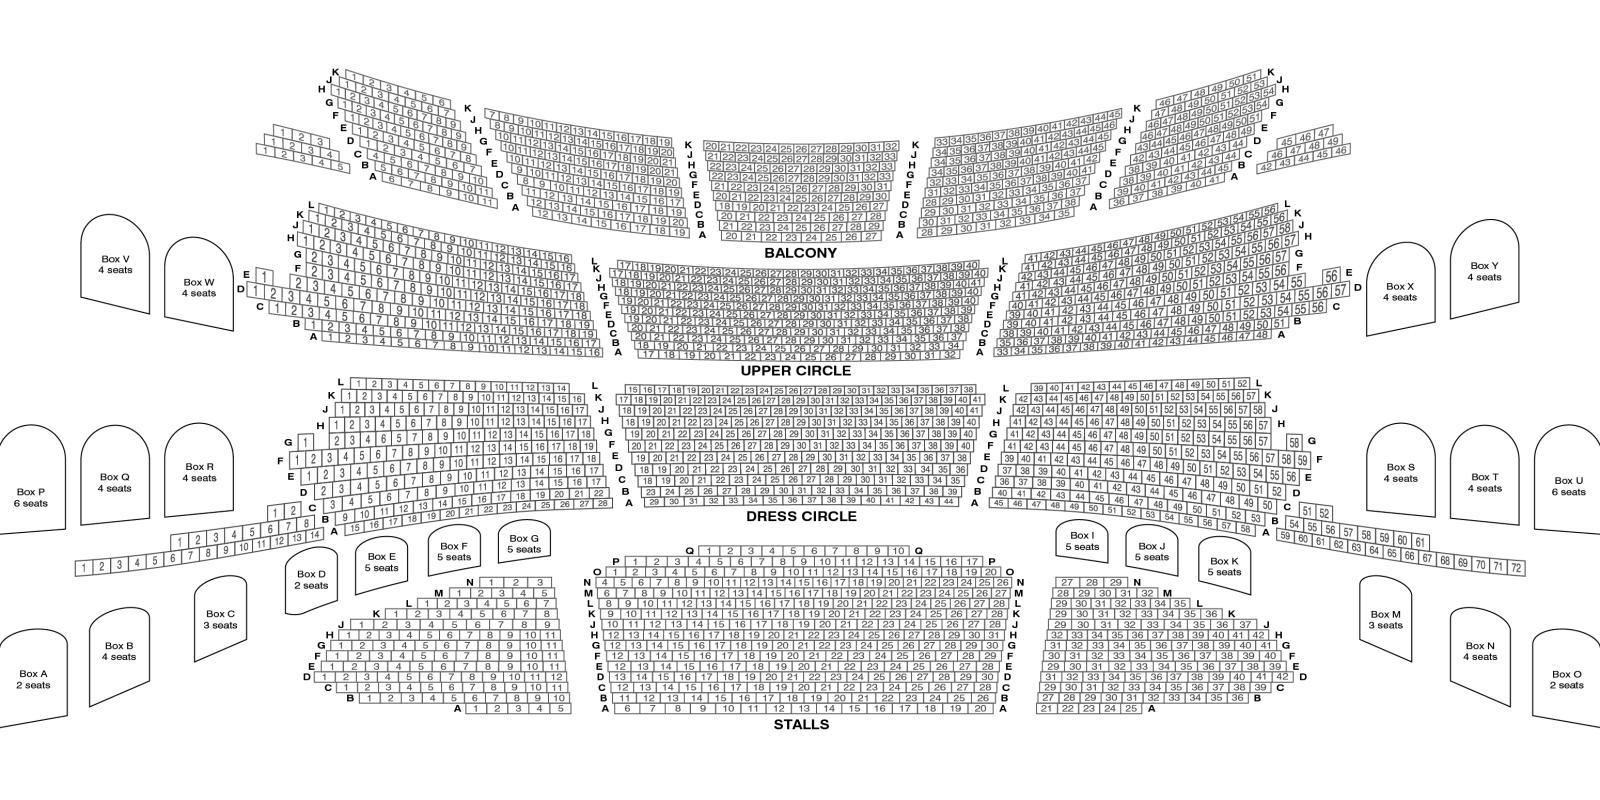 London Coliseum ENO seating plan